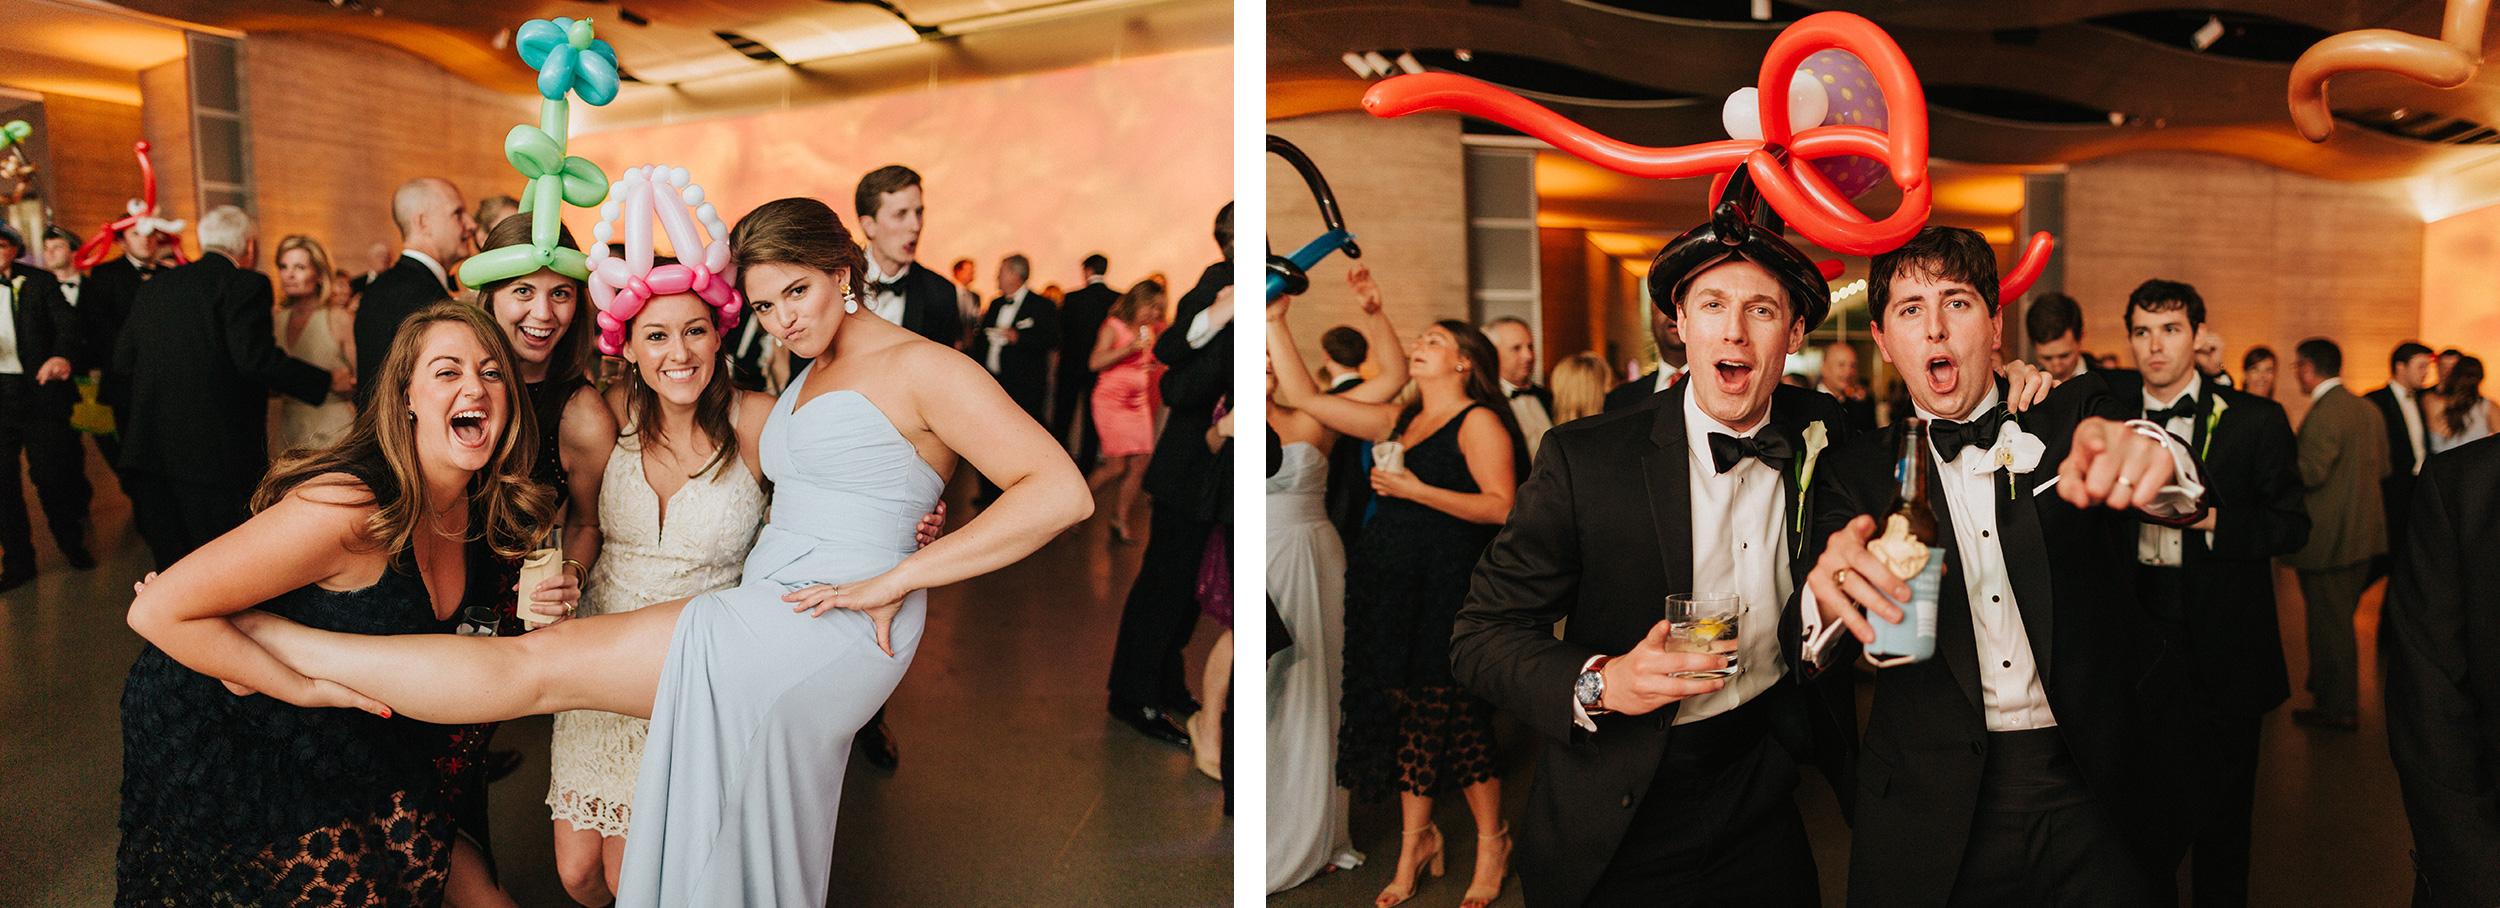 speed-art-museum-wedding-photographer-31.JPG